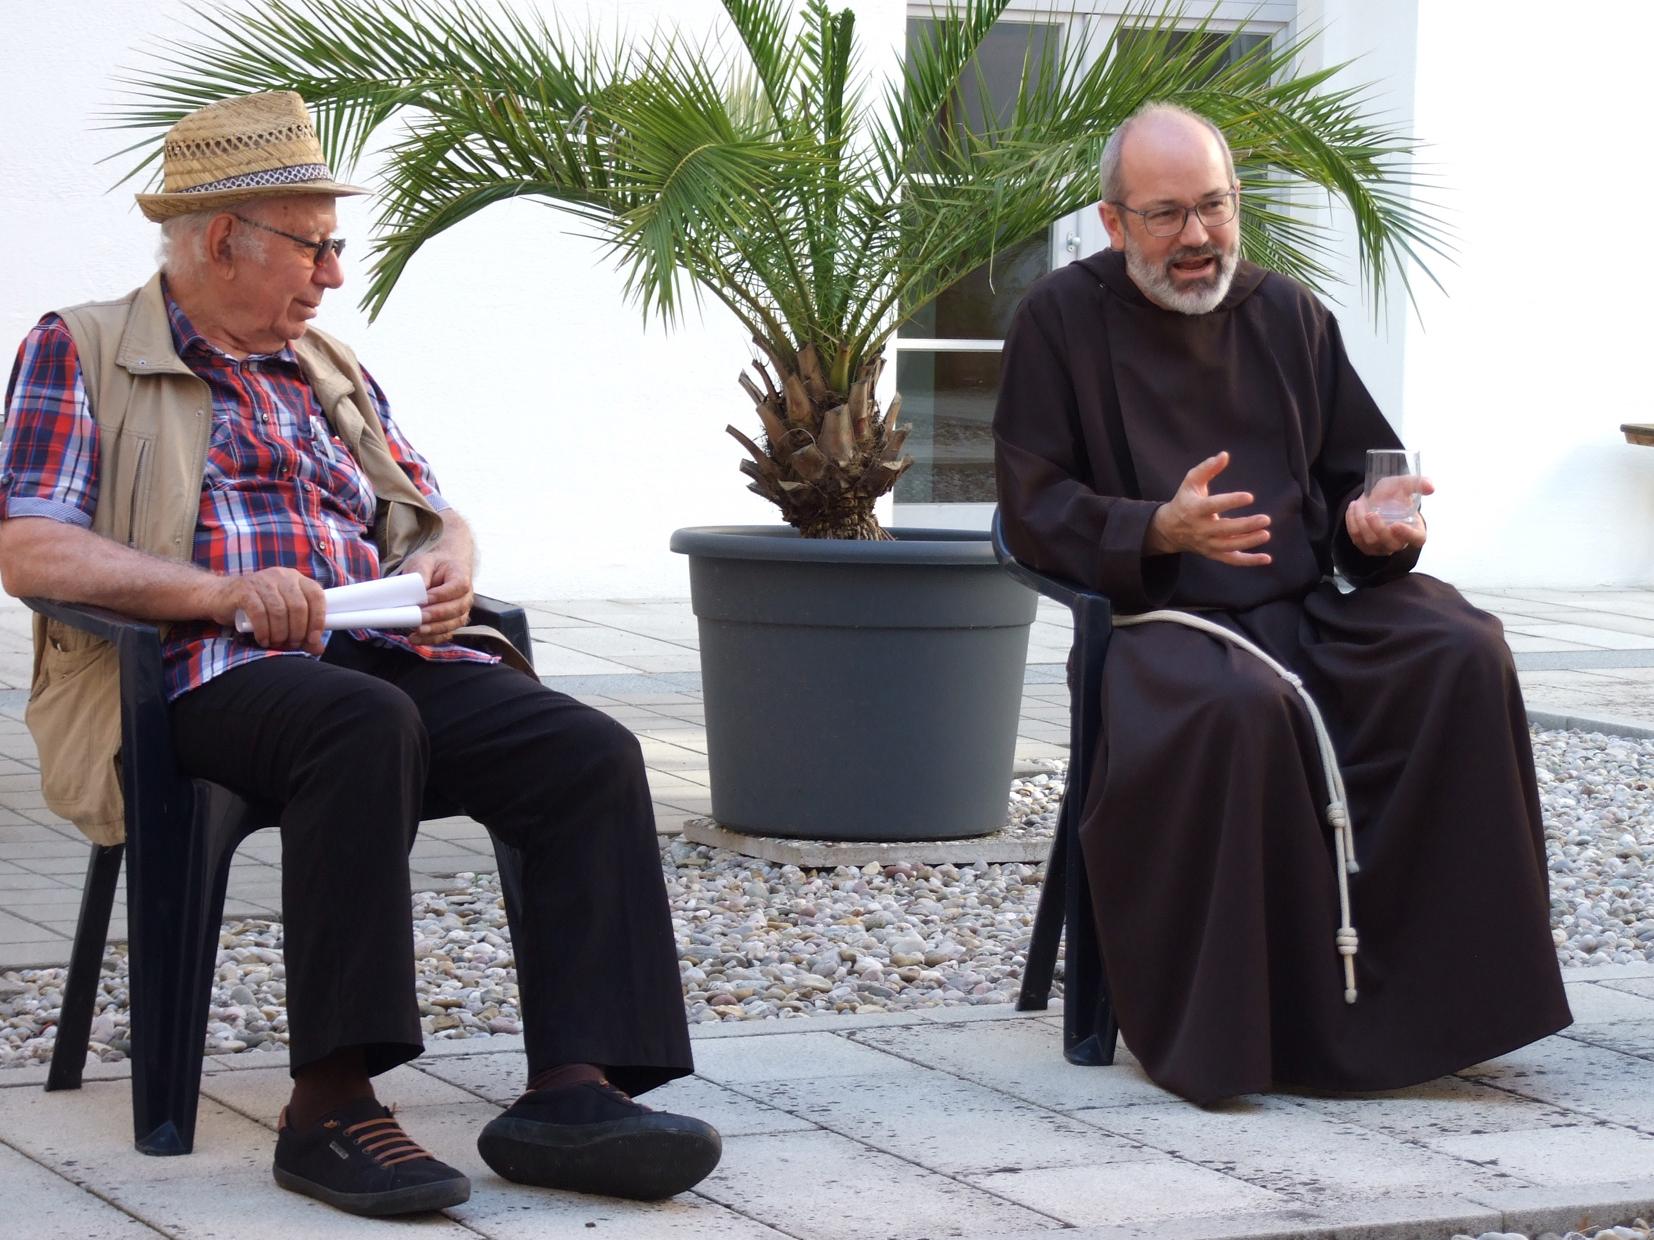 2020 07 27 aoelfb interreligioeses friedensgebet1